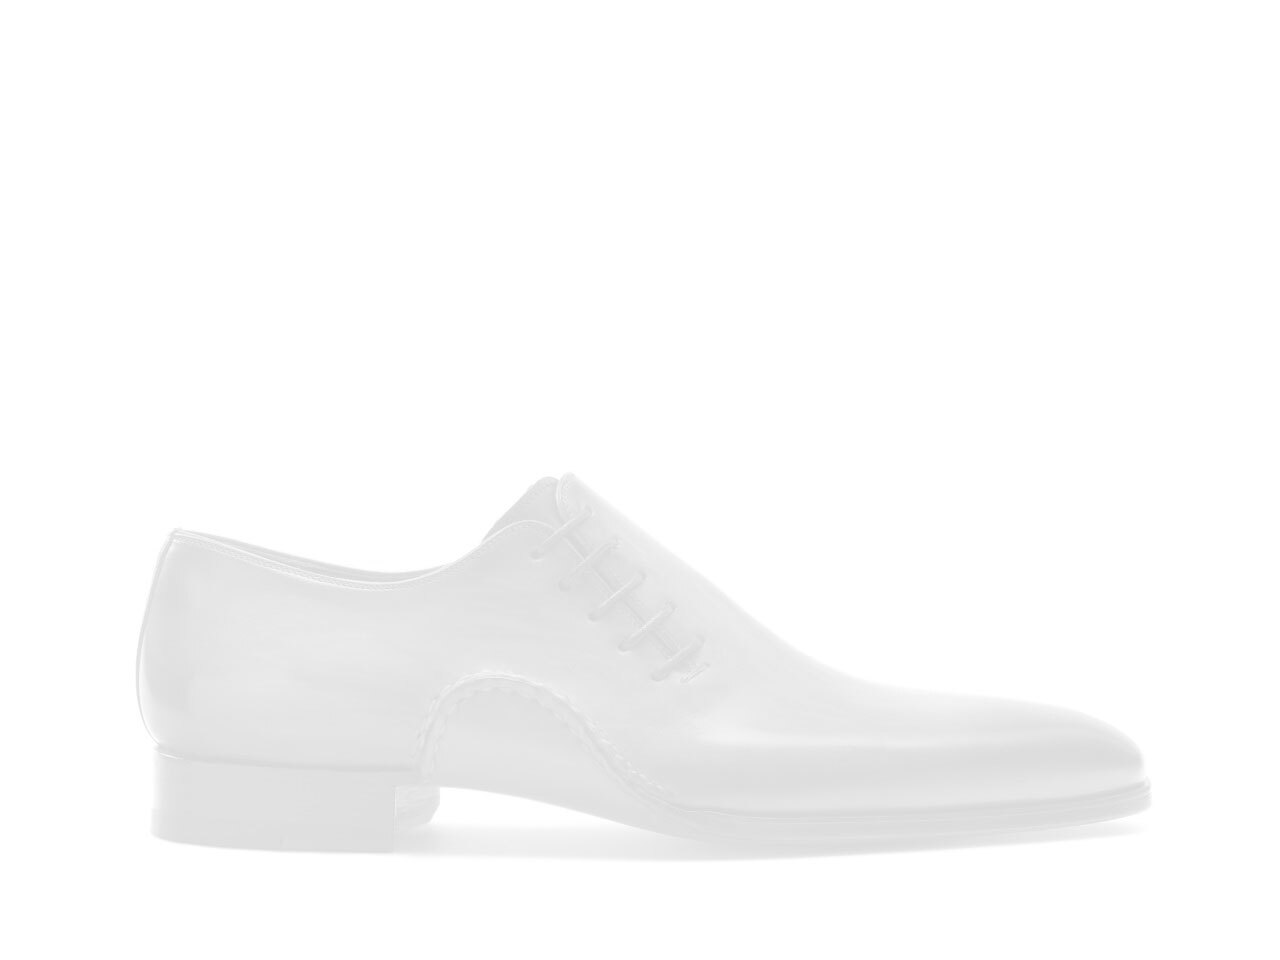 3fef337ab Magnanni | Handmade Men's Shoes | Online Exclusive Designs